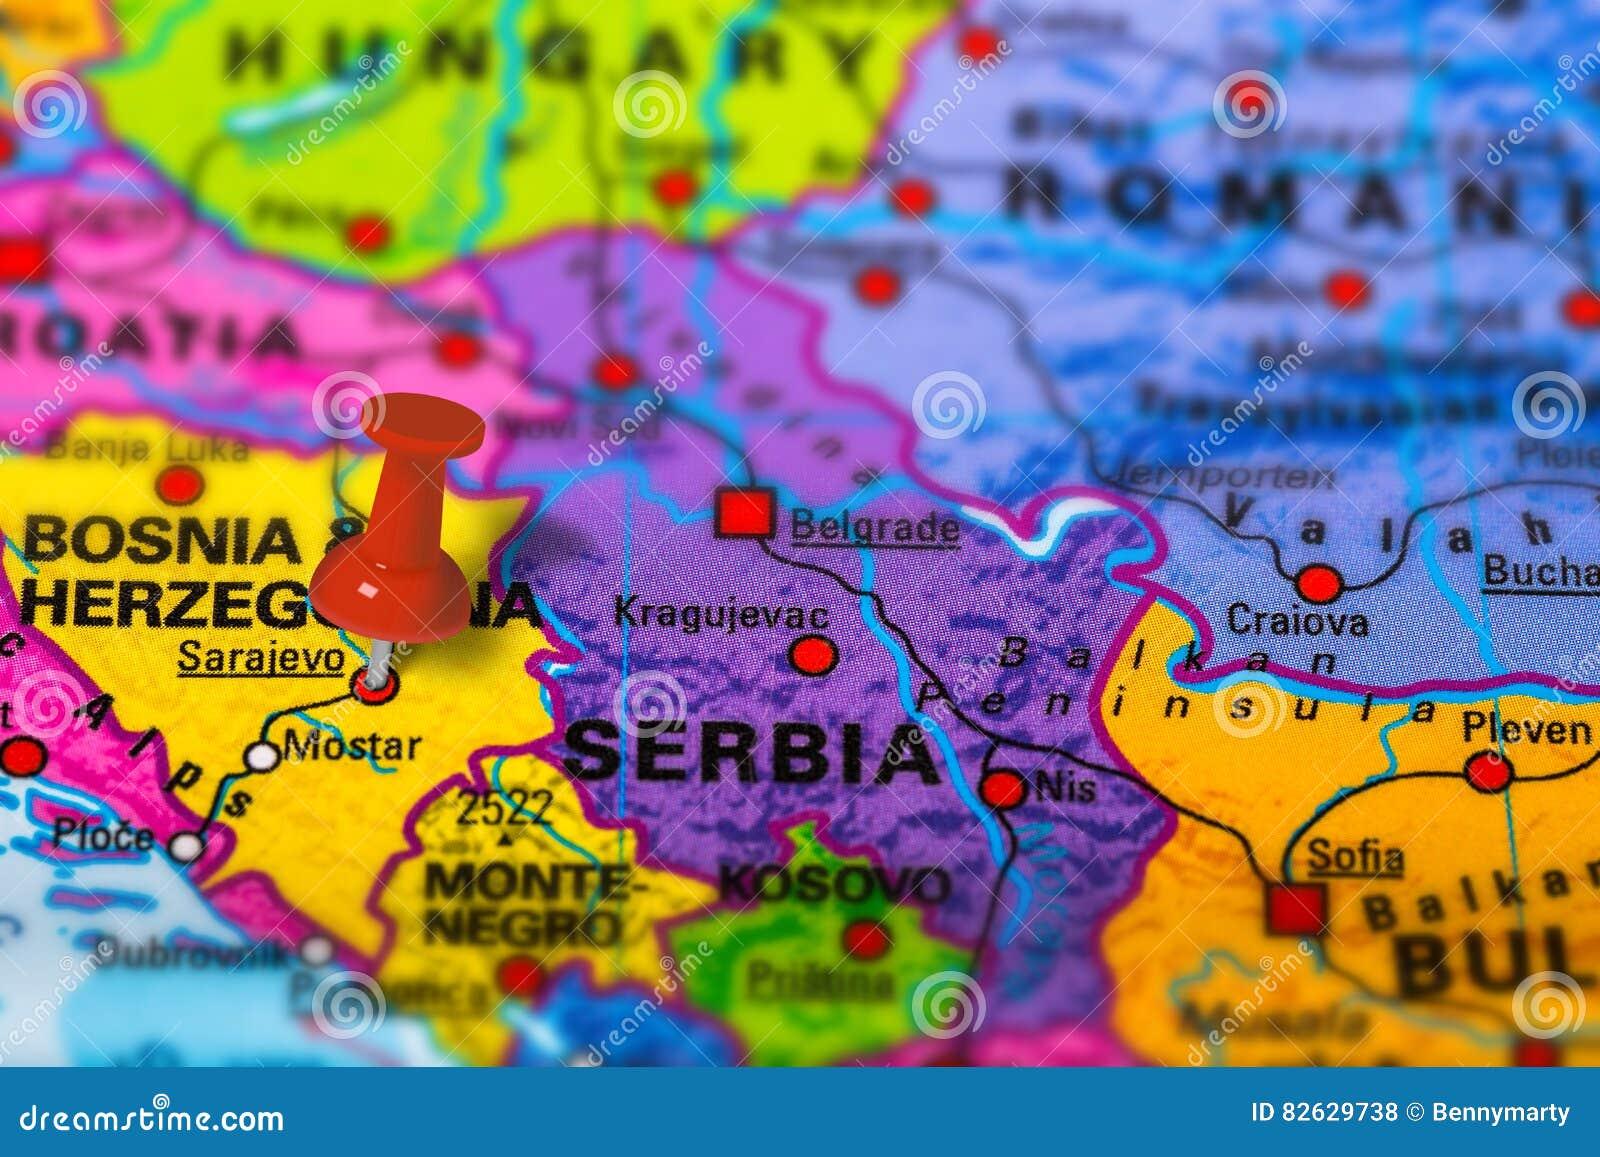 Sarajevo Bosnia Map Stock Photo Image Of Marker Bosnia 82629738